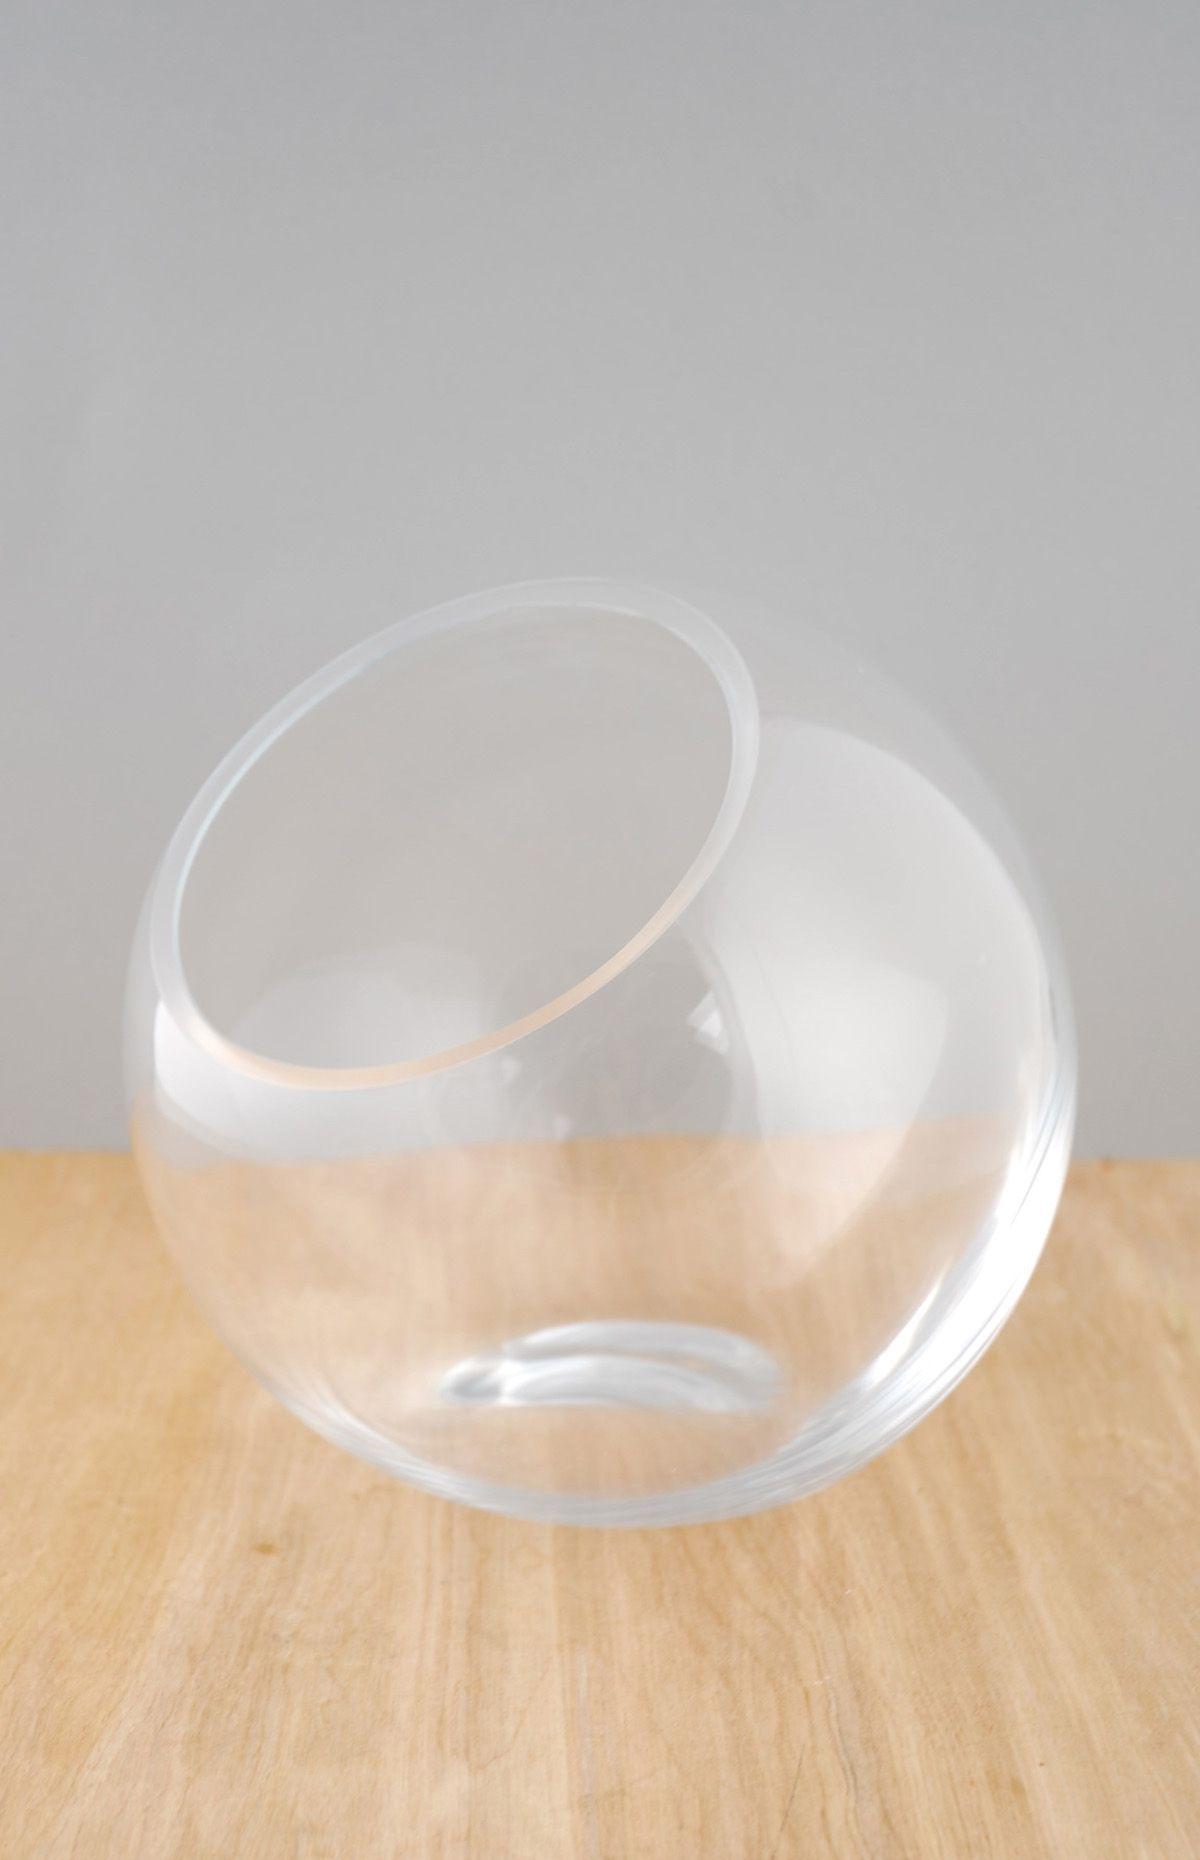 Studio glass terrarium candleholder bowl 75 x 7 centerpieces studio glass 75 x 7 glass orb bowl floridaeventfo Choice Image